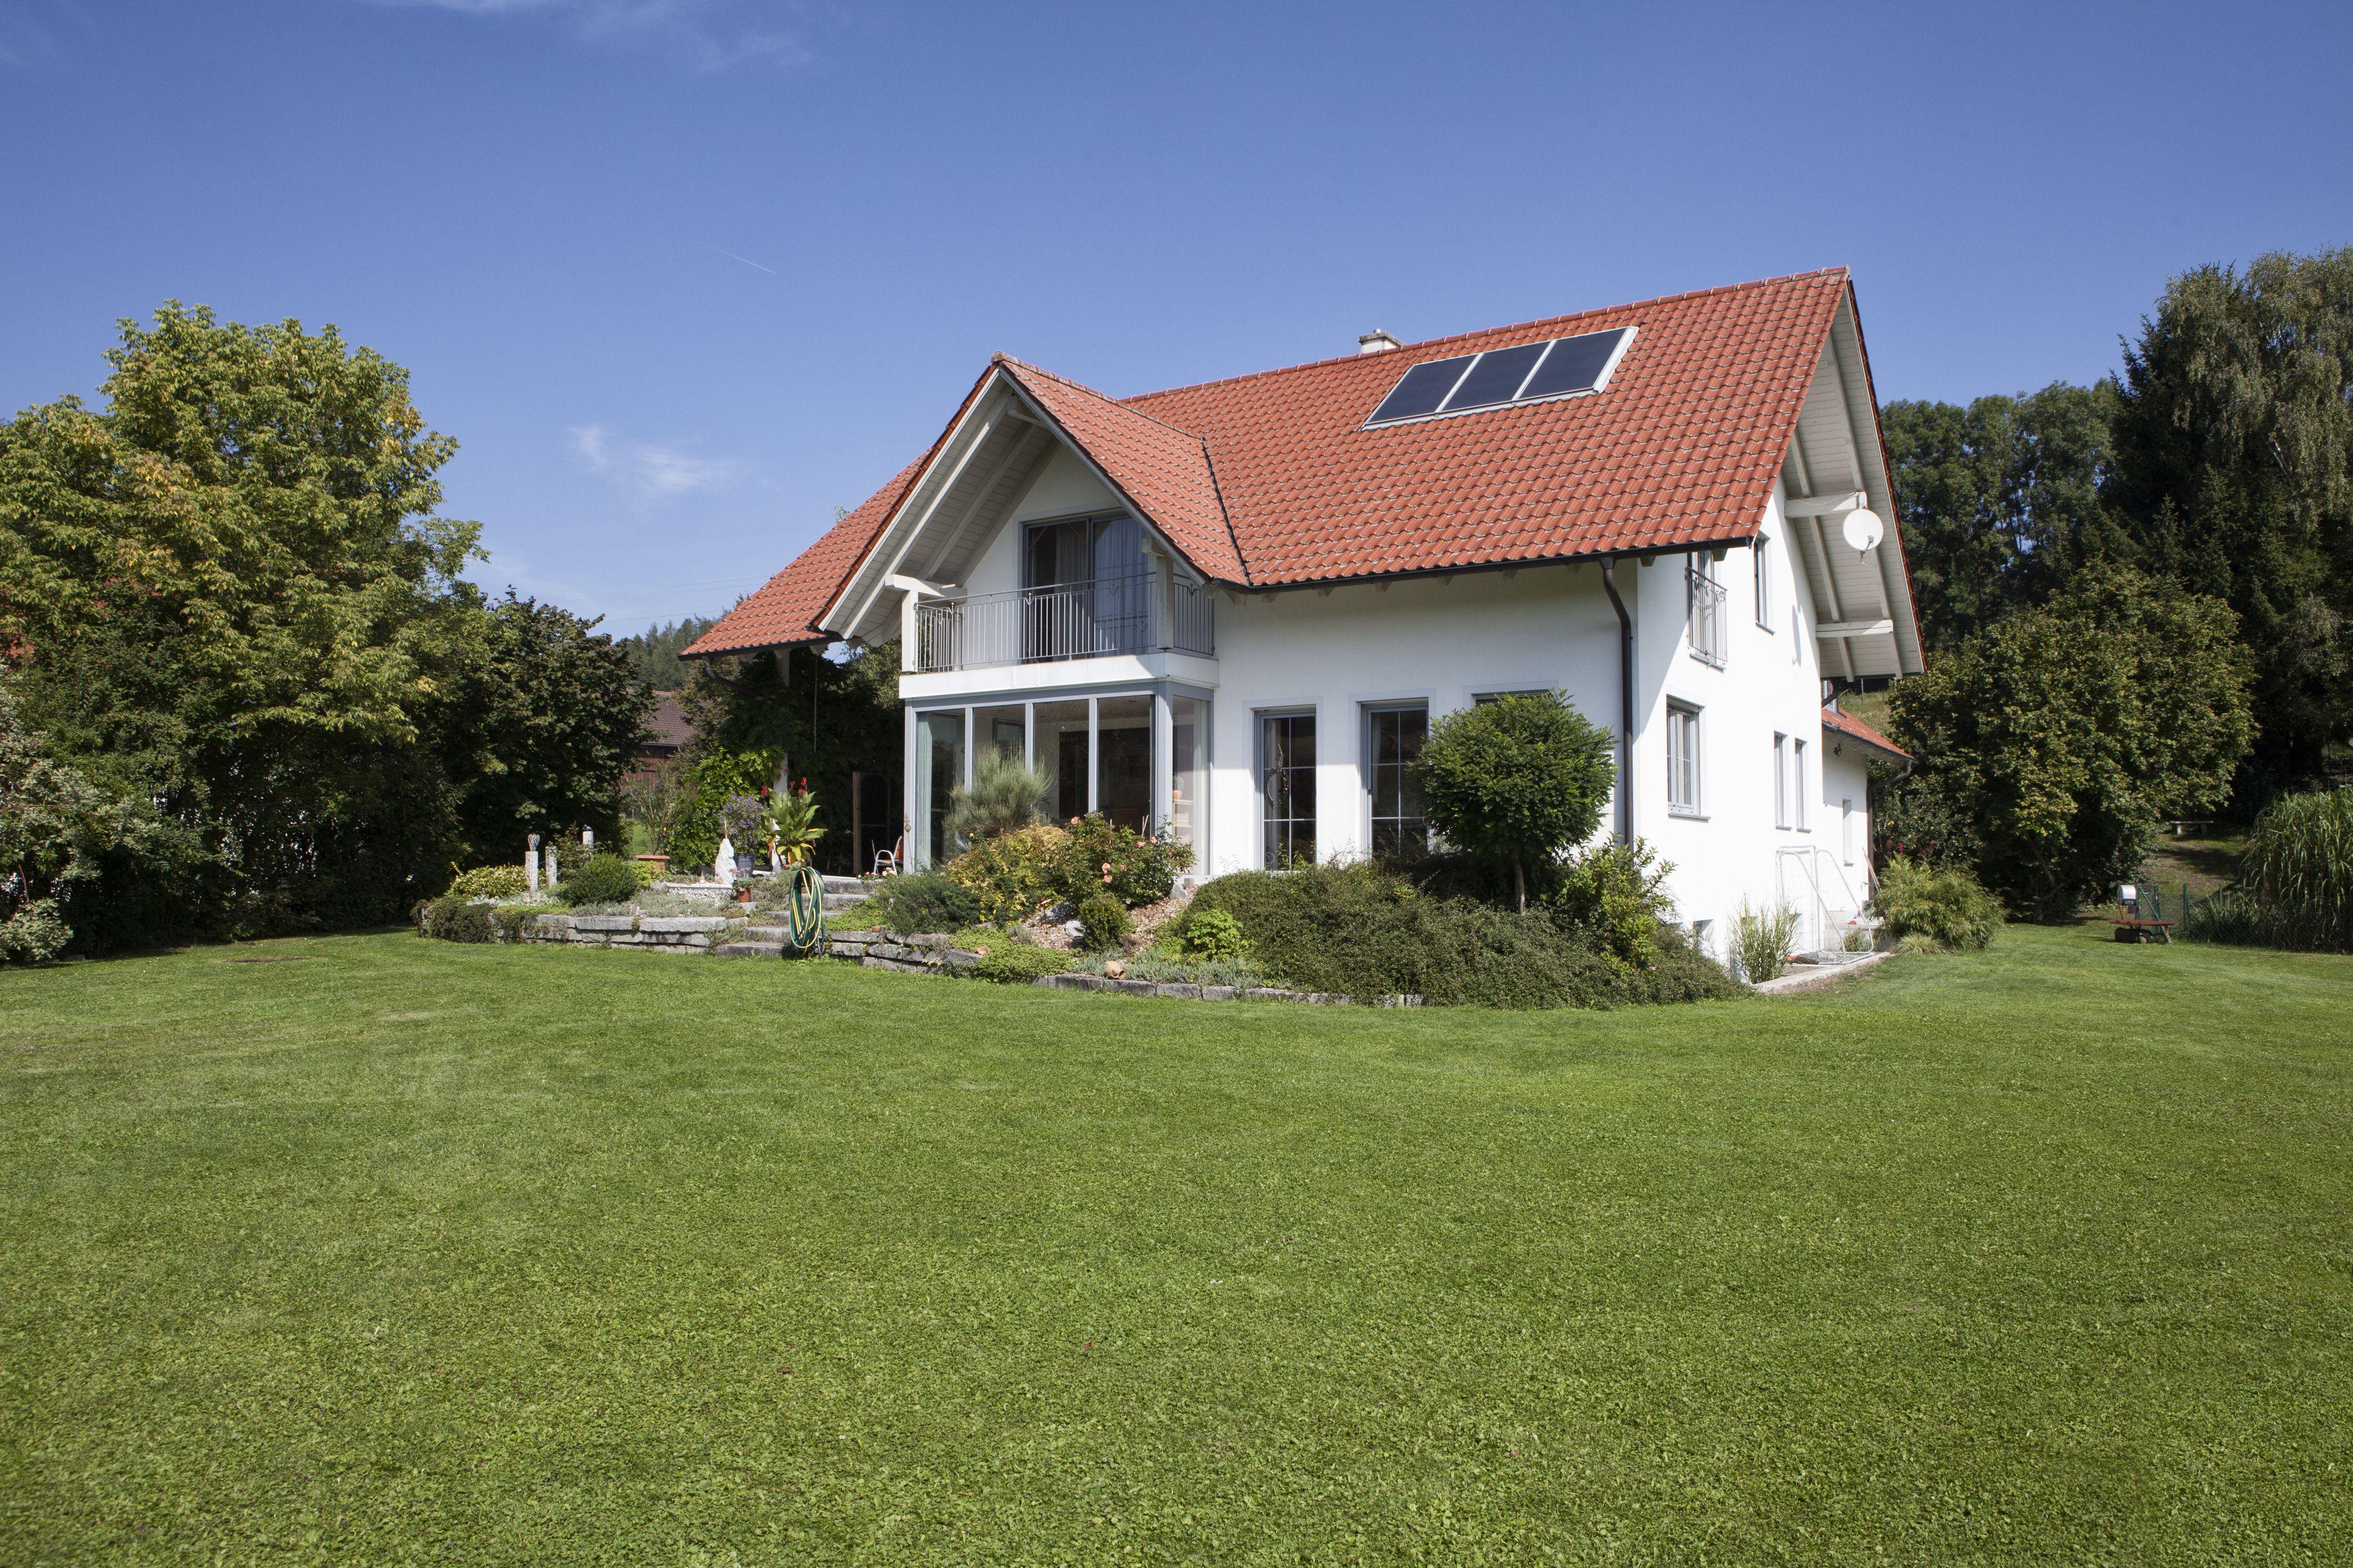 single-family house with garden